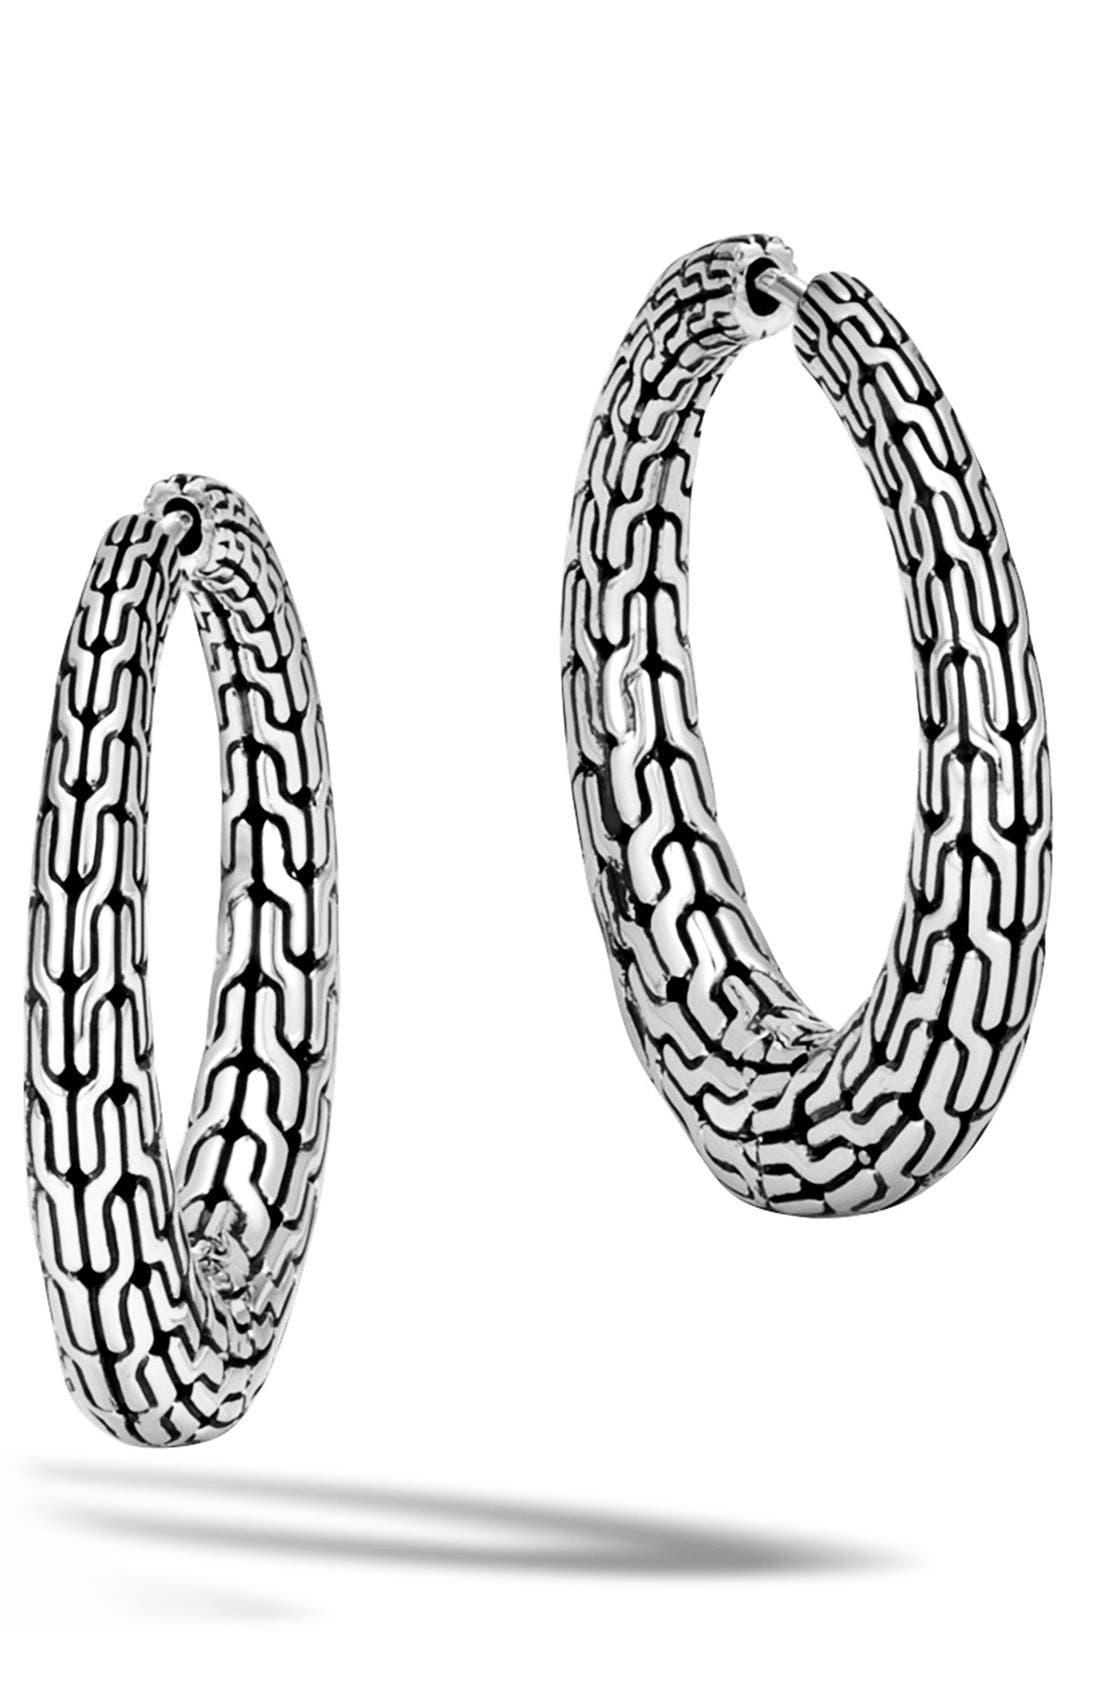 JOHN HARDY Classic Chain Small Hinge Hoop Earrings, Main, color, SILVER